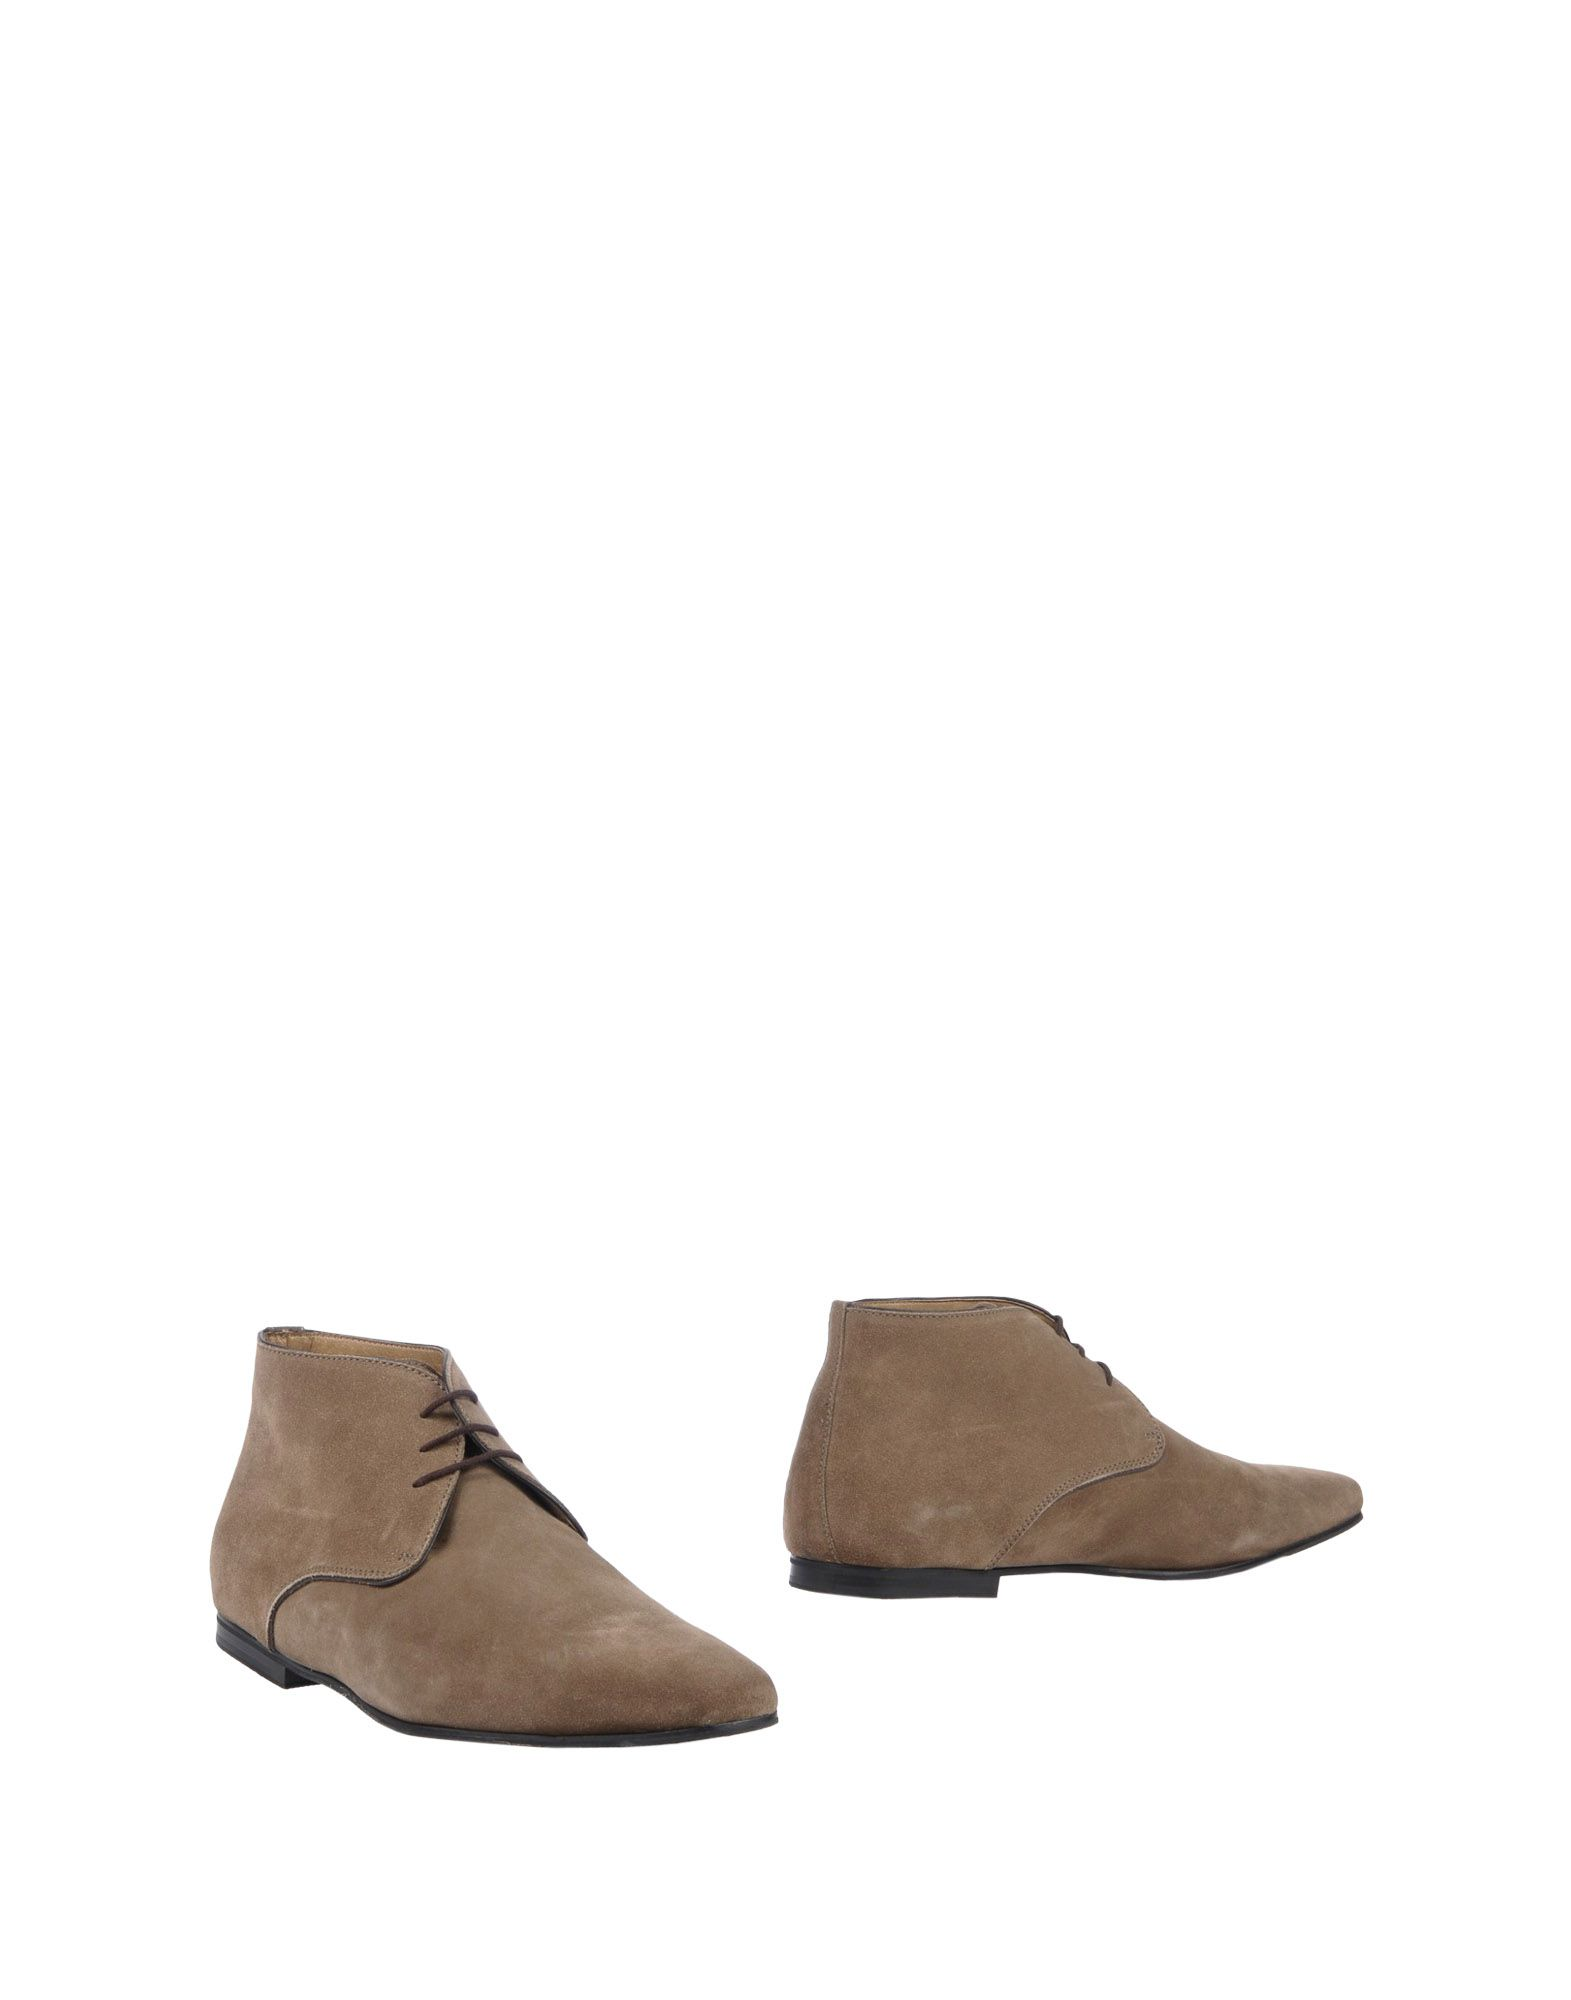 ANDREA VENTURA FIRENZE Полусапоги и высокие ботинки le cortina by andrea ventura полусапоги и высокие ботинки